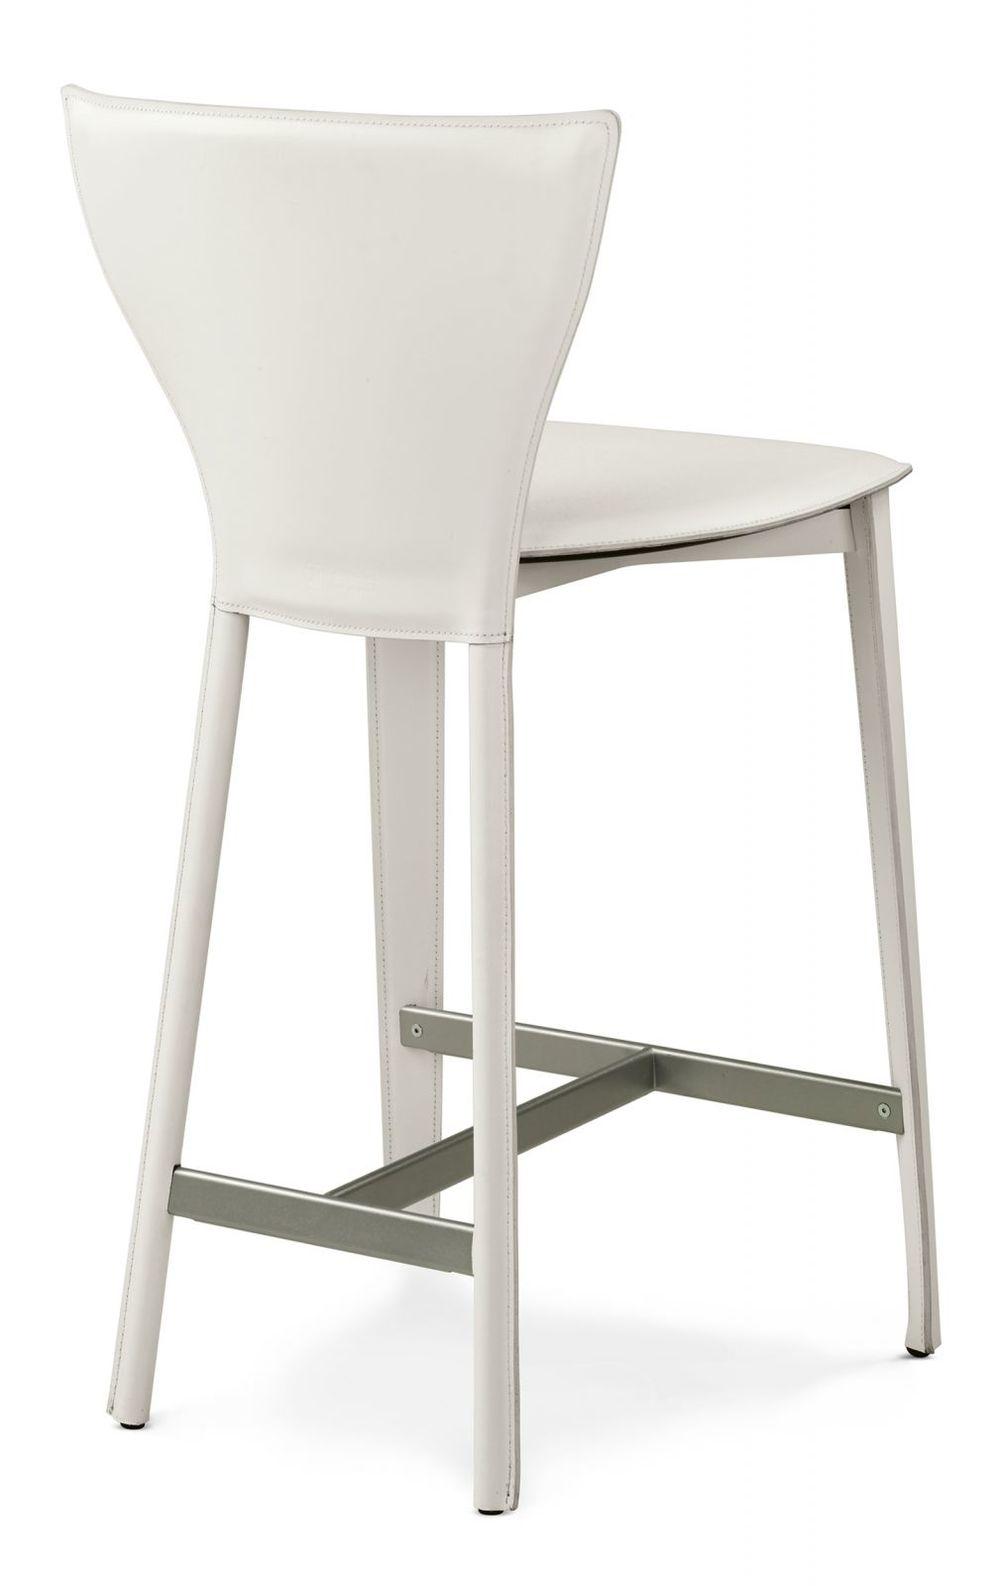 modern-bar-stools-Italian-furniture-large (23).jpg